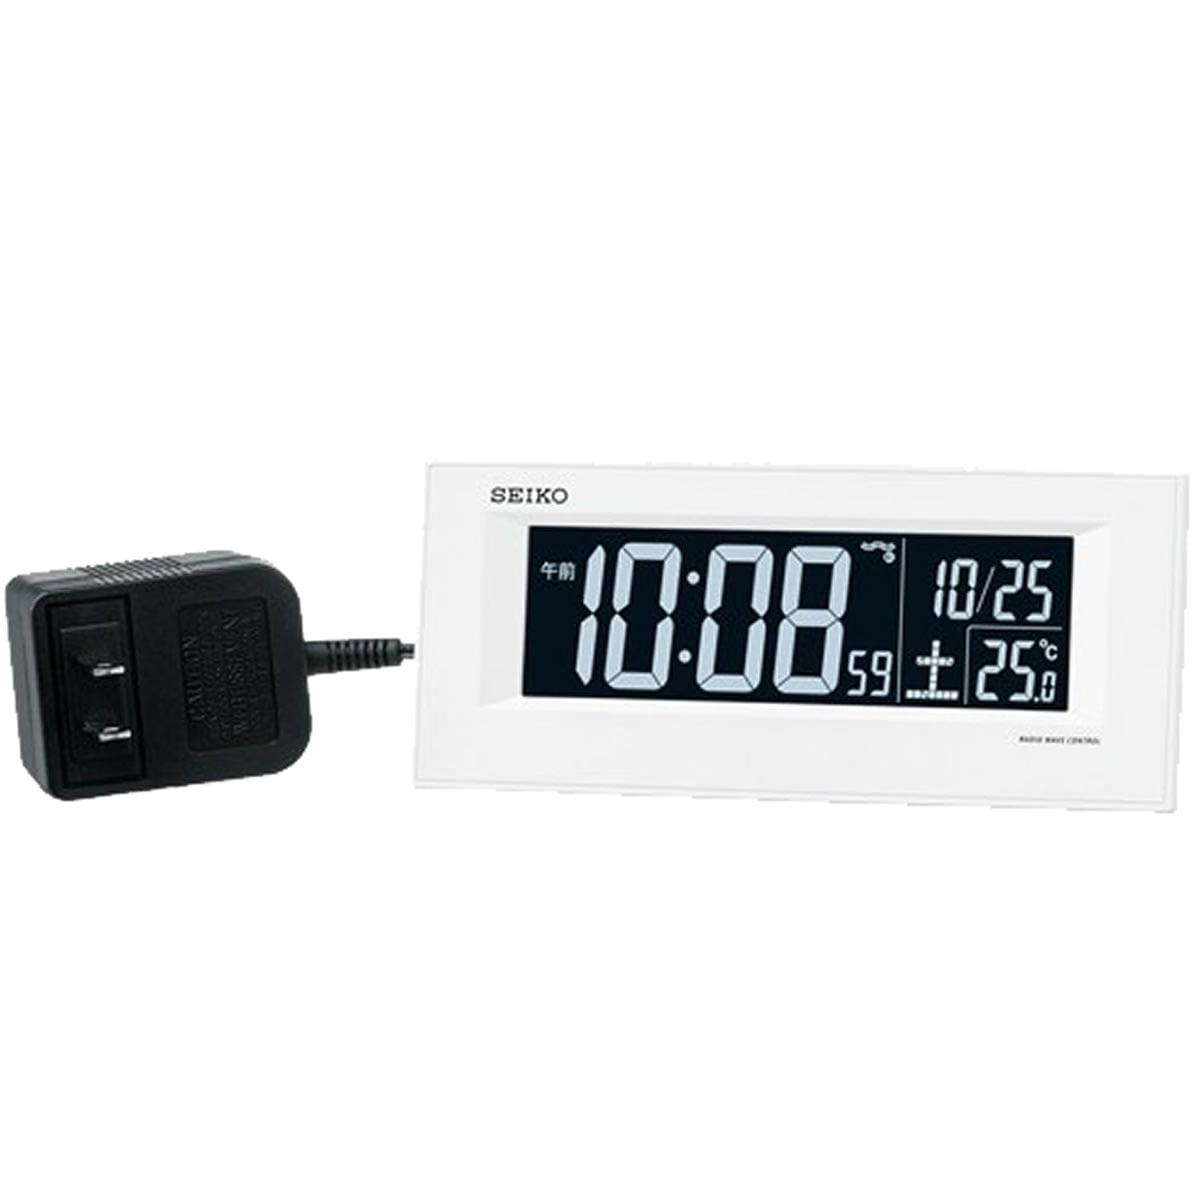 SEIKO セイコー 夜でも見える アラーム付 デジタル電波置き時計 DL209W 白